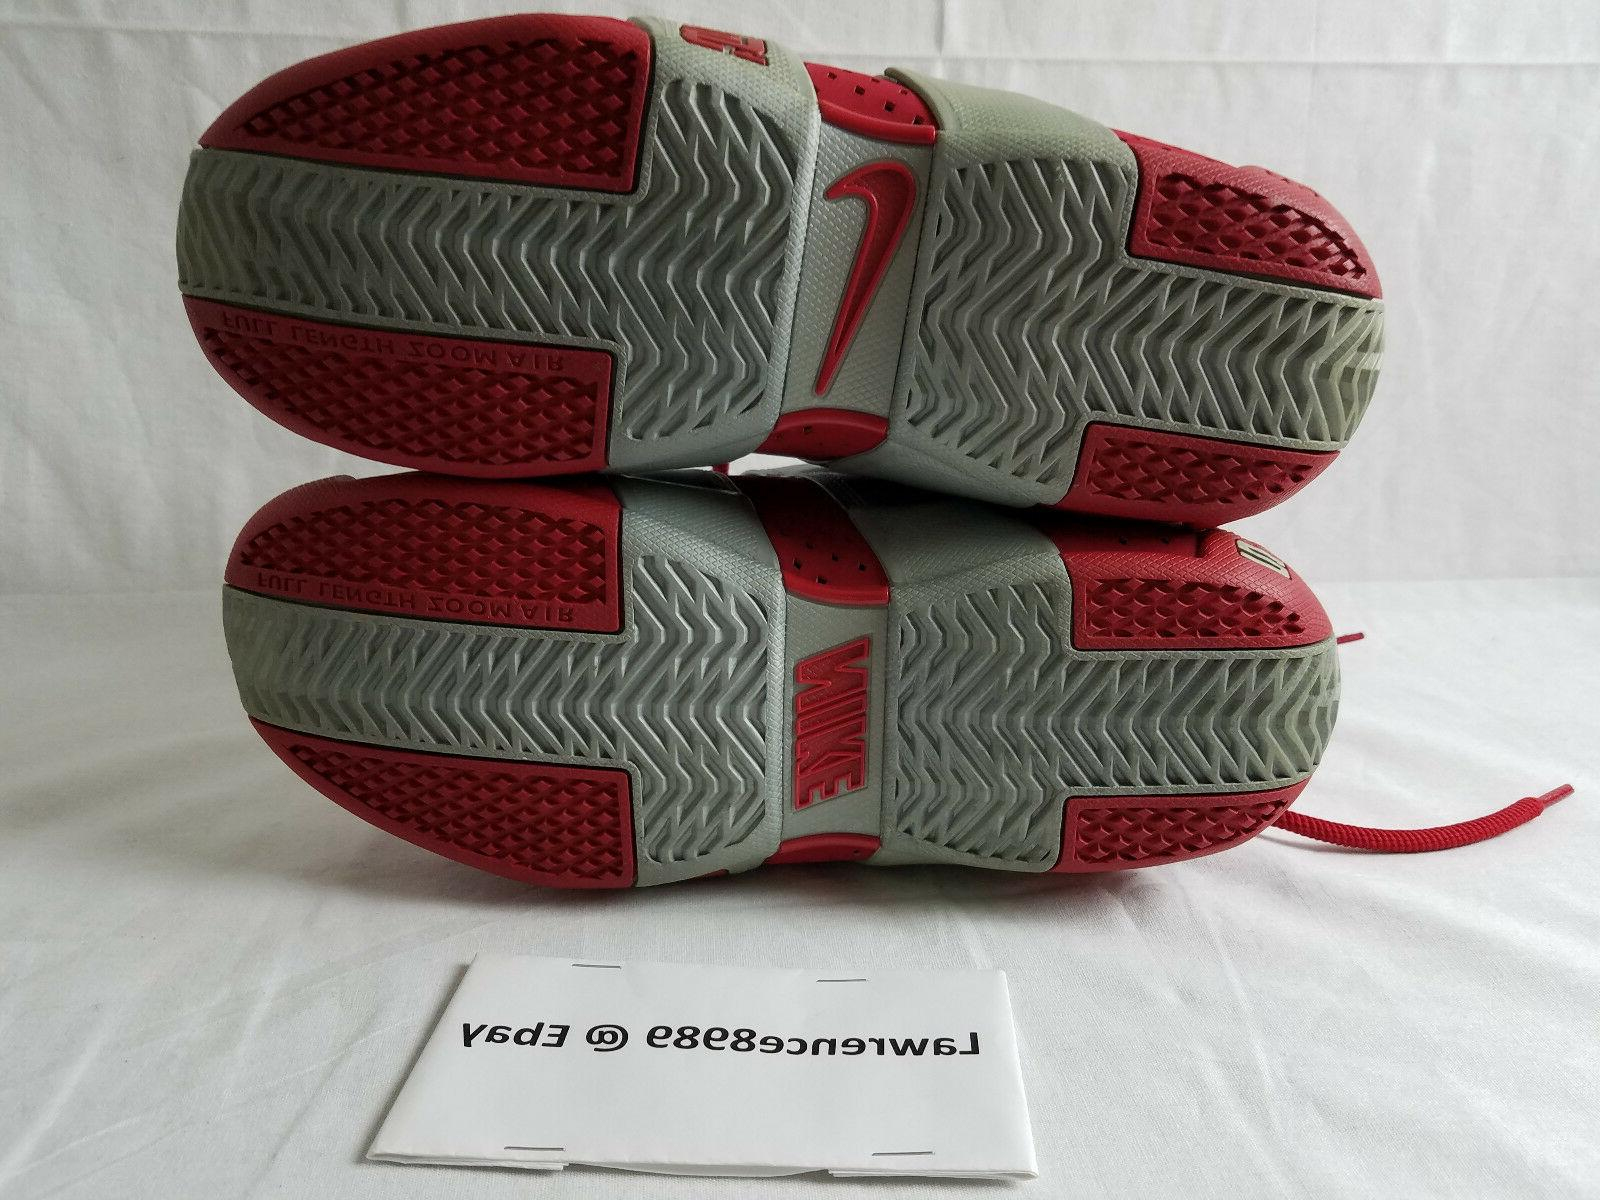 Rare 20-5-5 Basketball Shoes 23 2 3 5 6